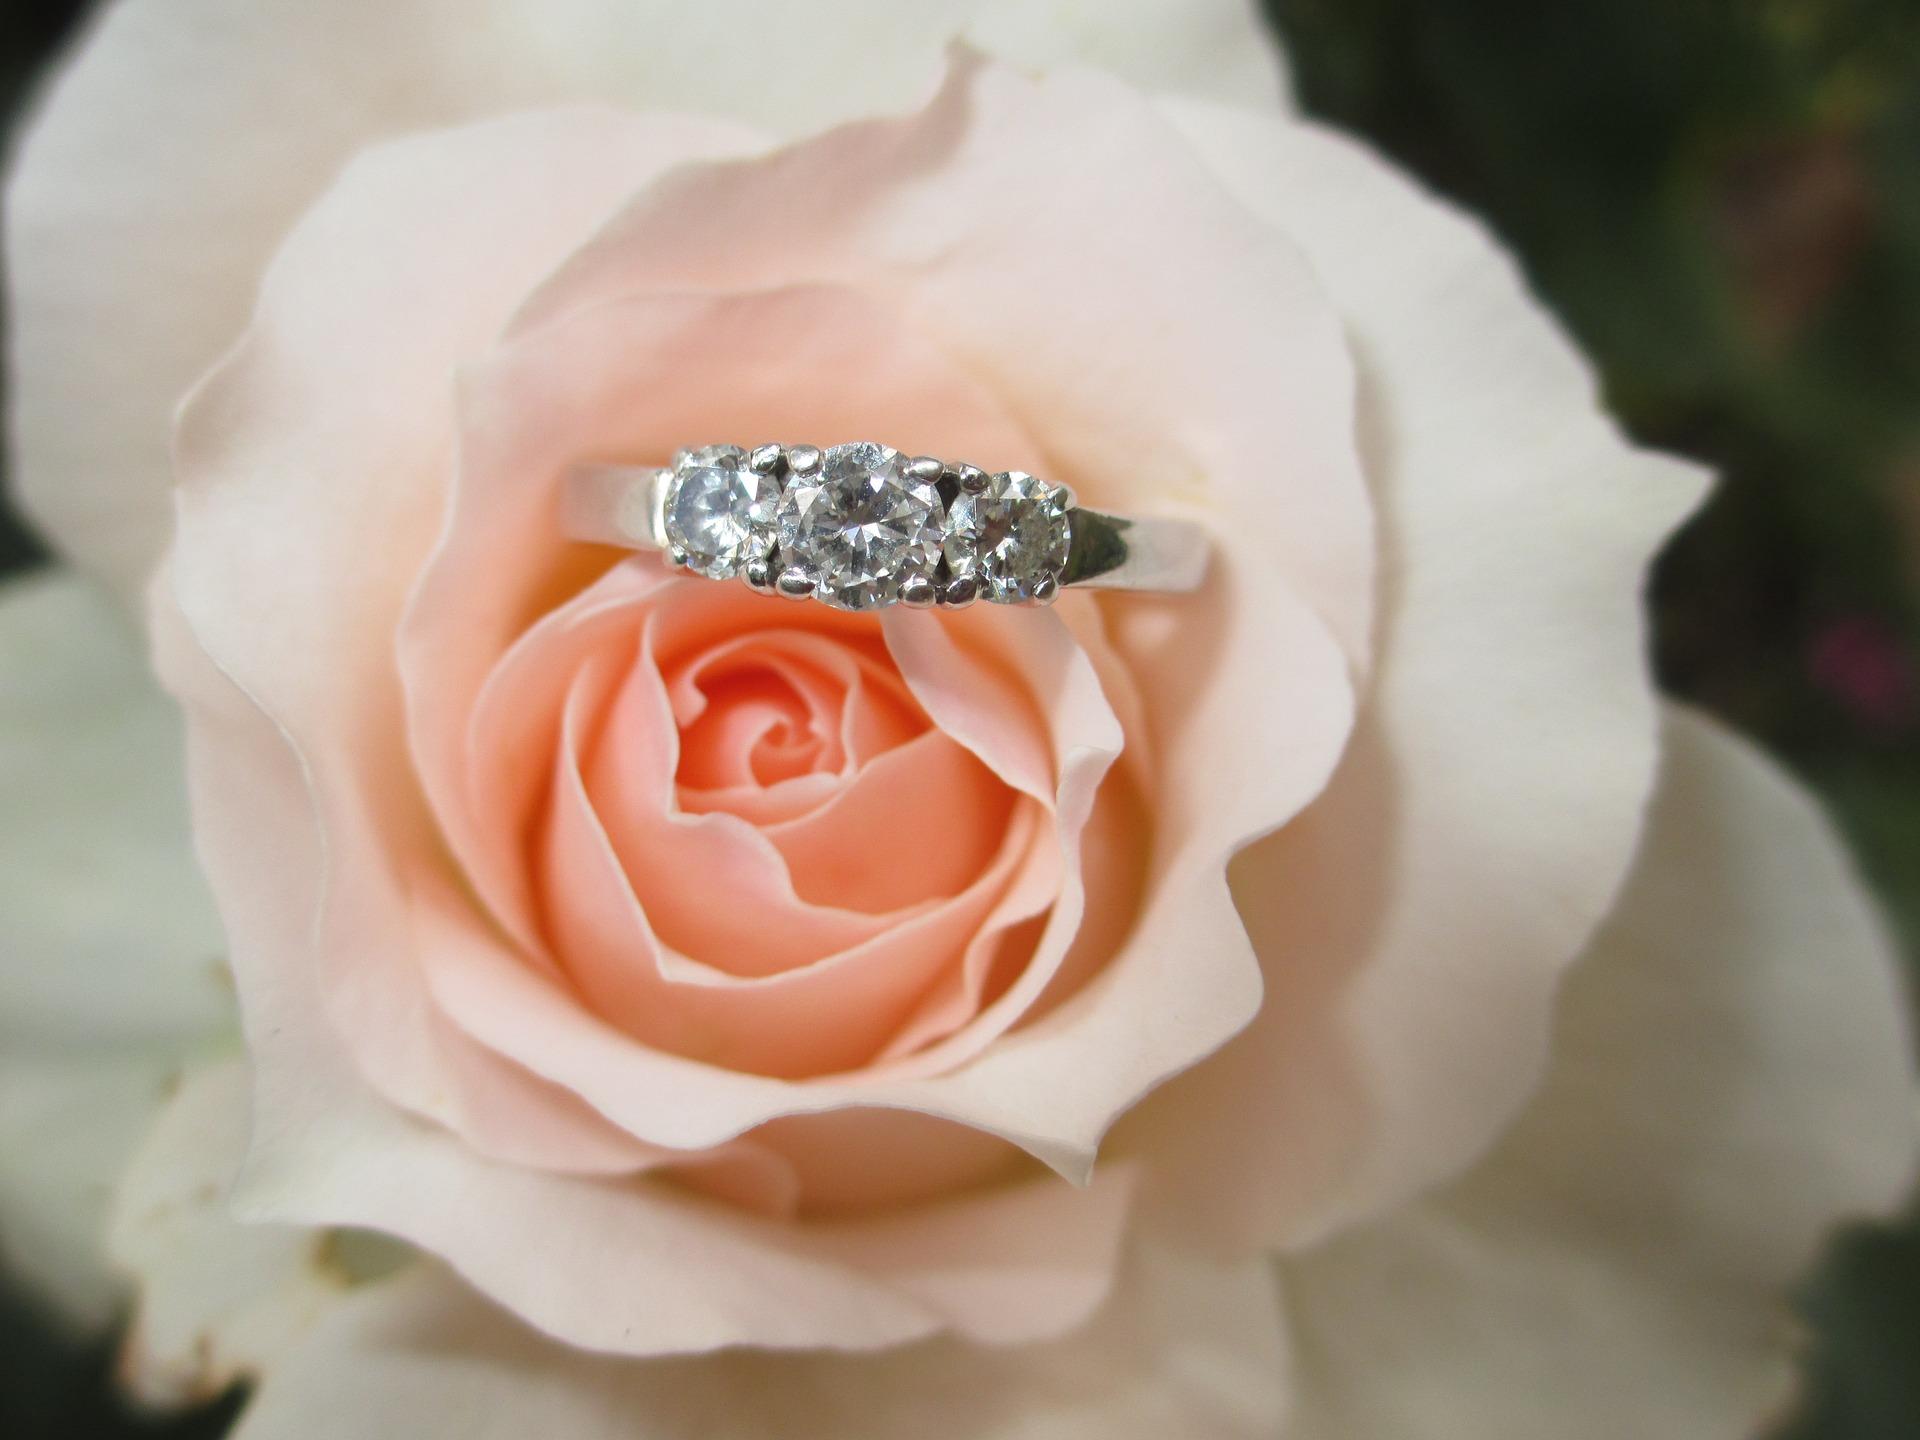 ring-1665611_1920.jpg